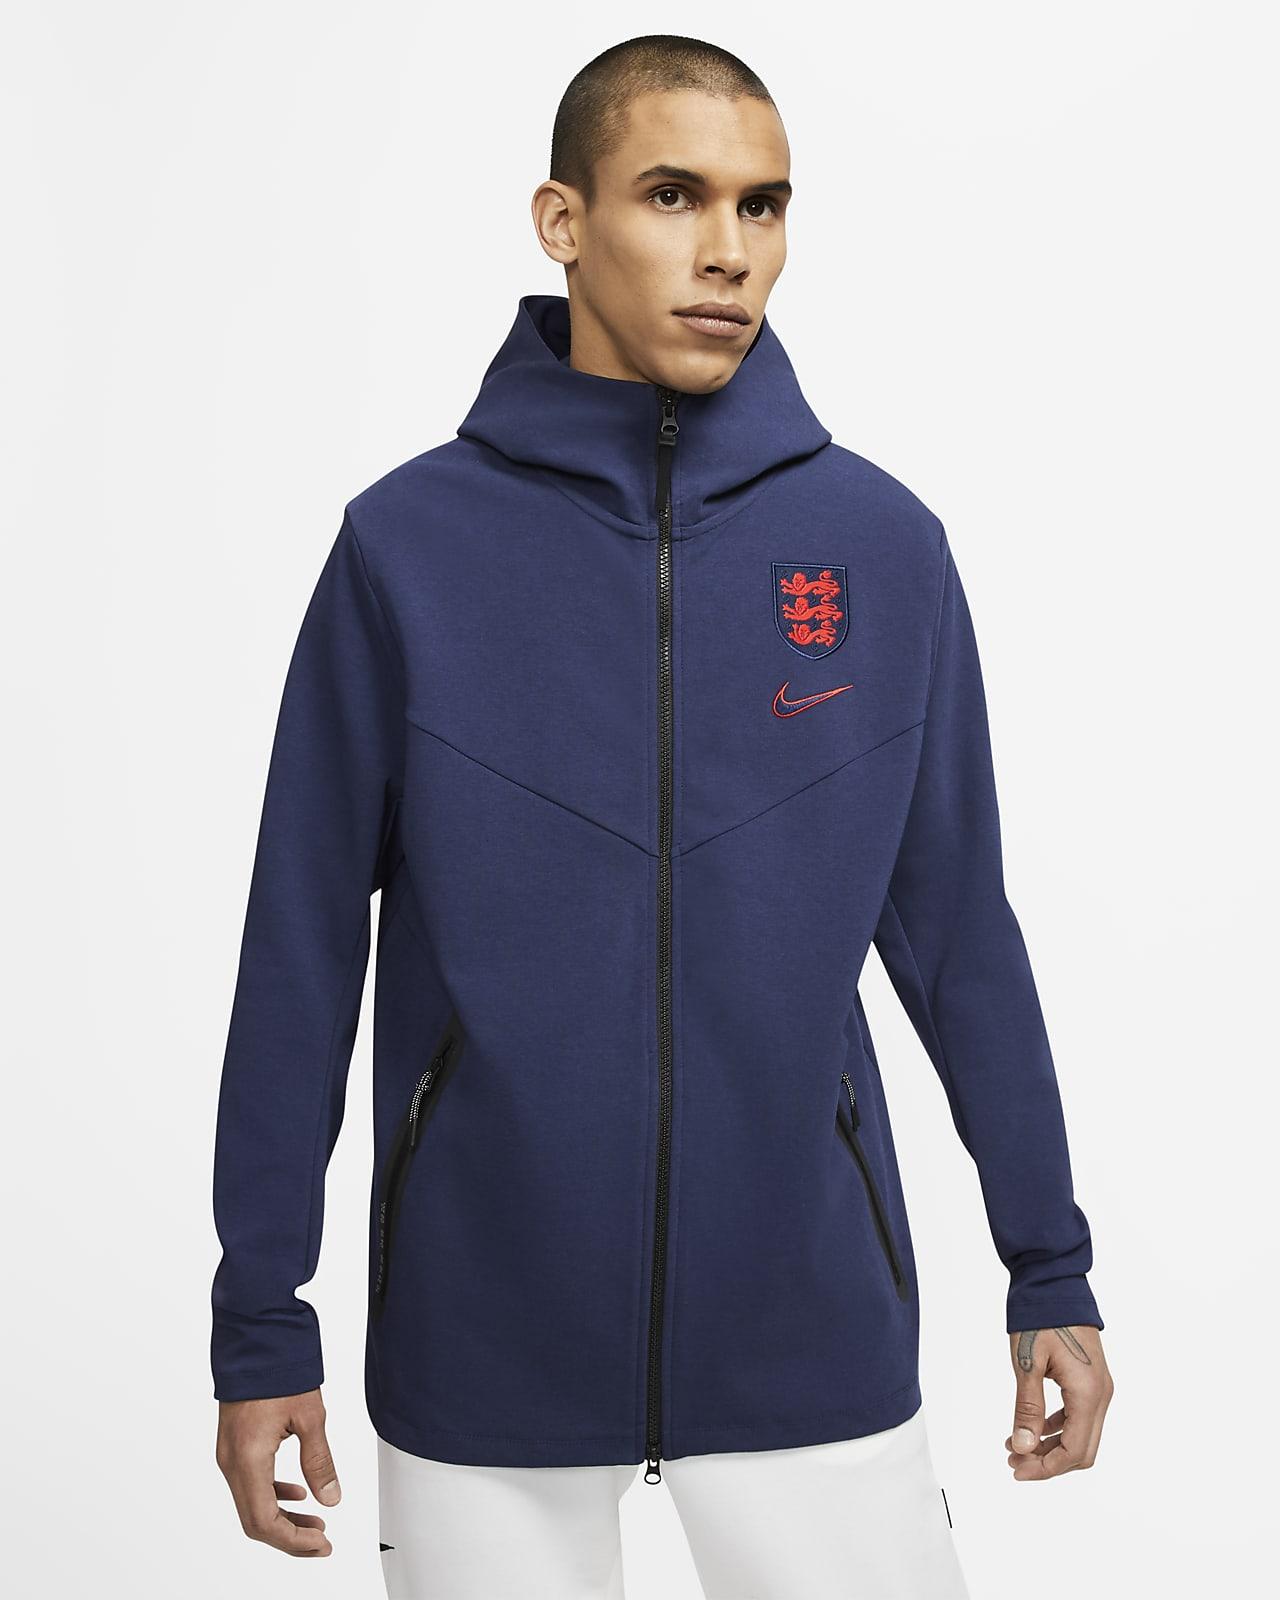 England Tech Pack Men's Full-Zip Hoodie